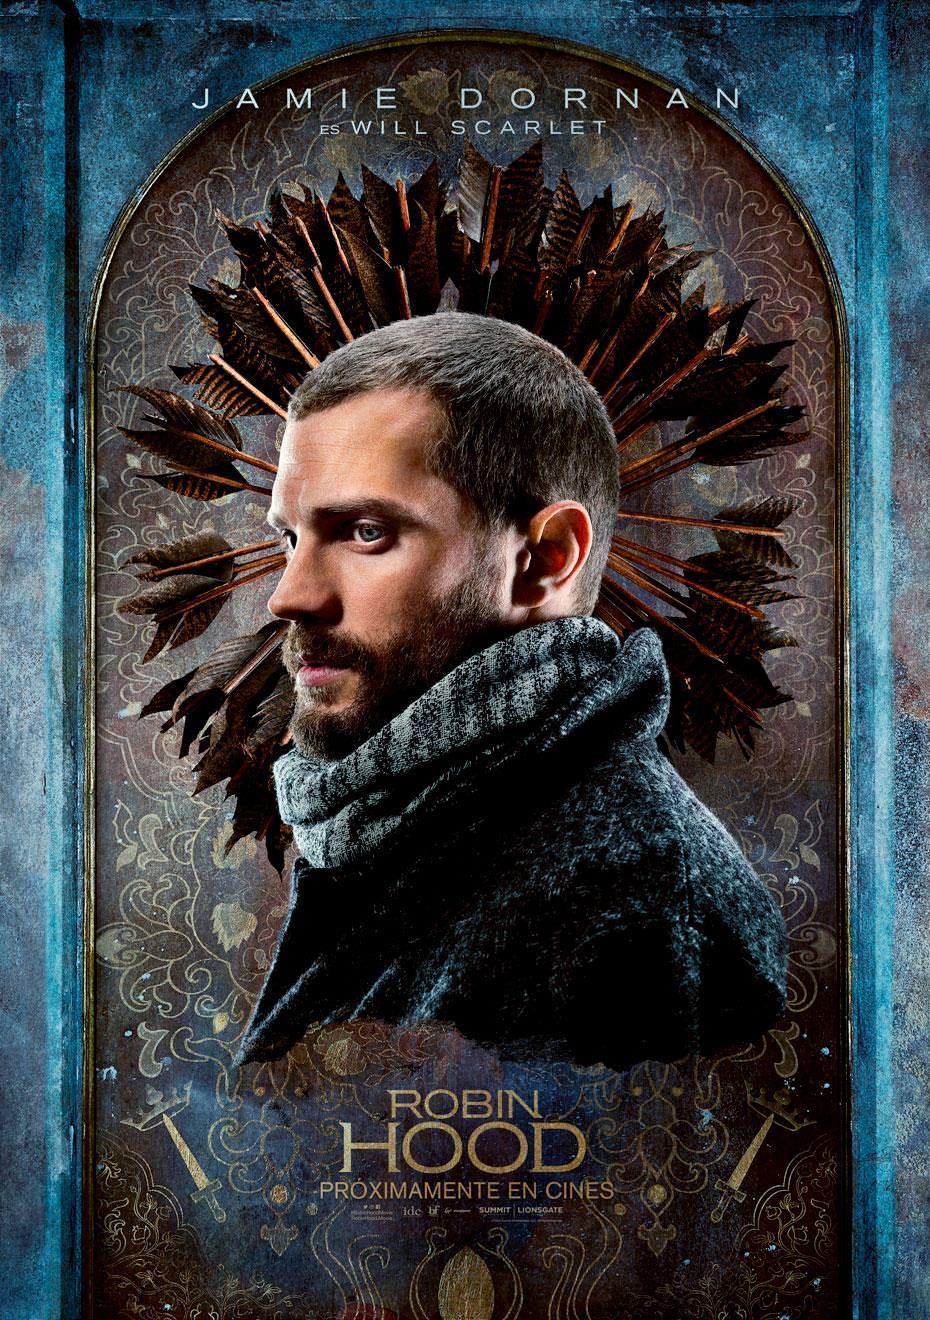 Robin Hood 2018 Posters De Personajes Robin Hood Jamie Dornan Robin